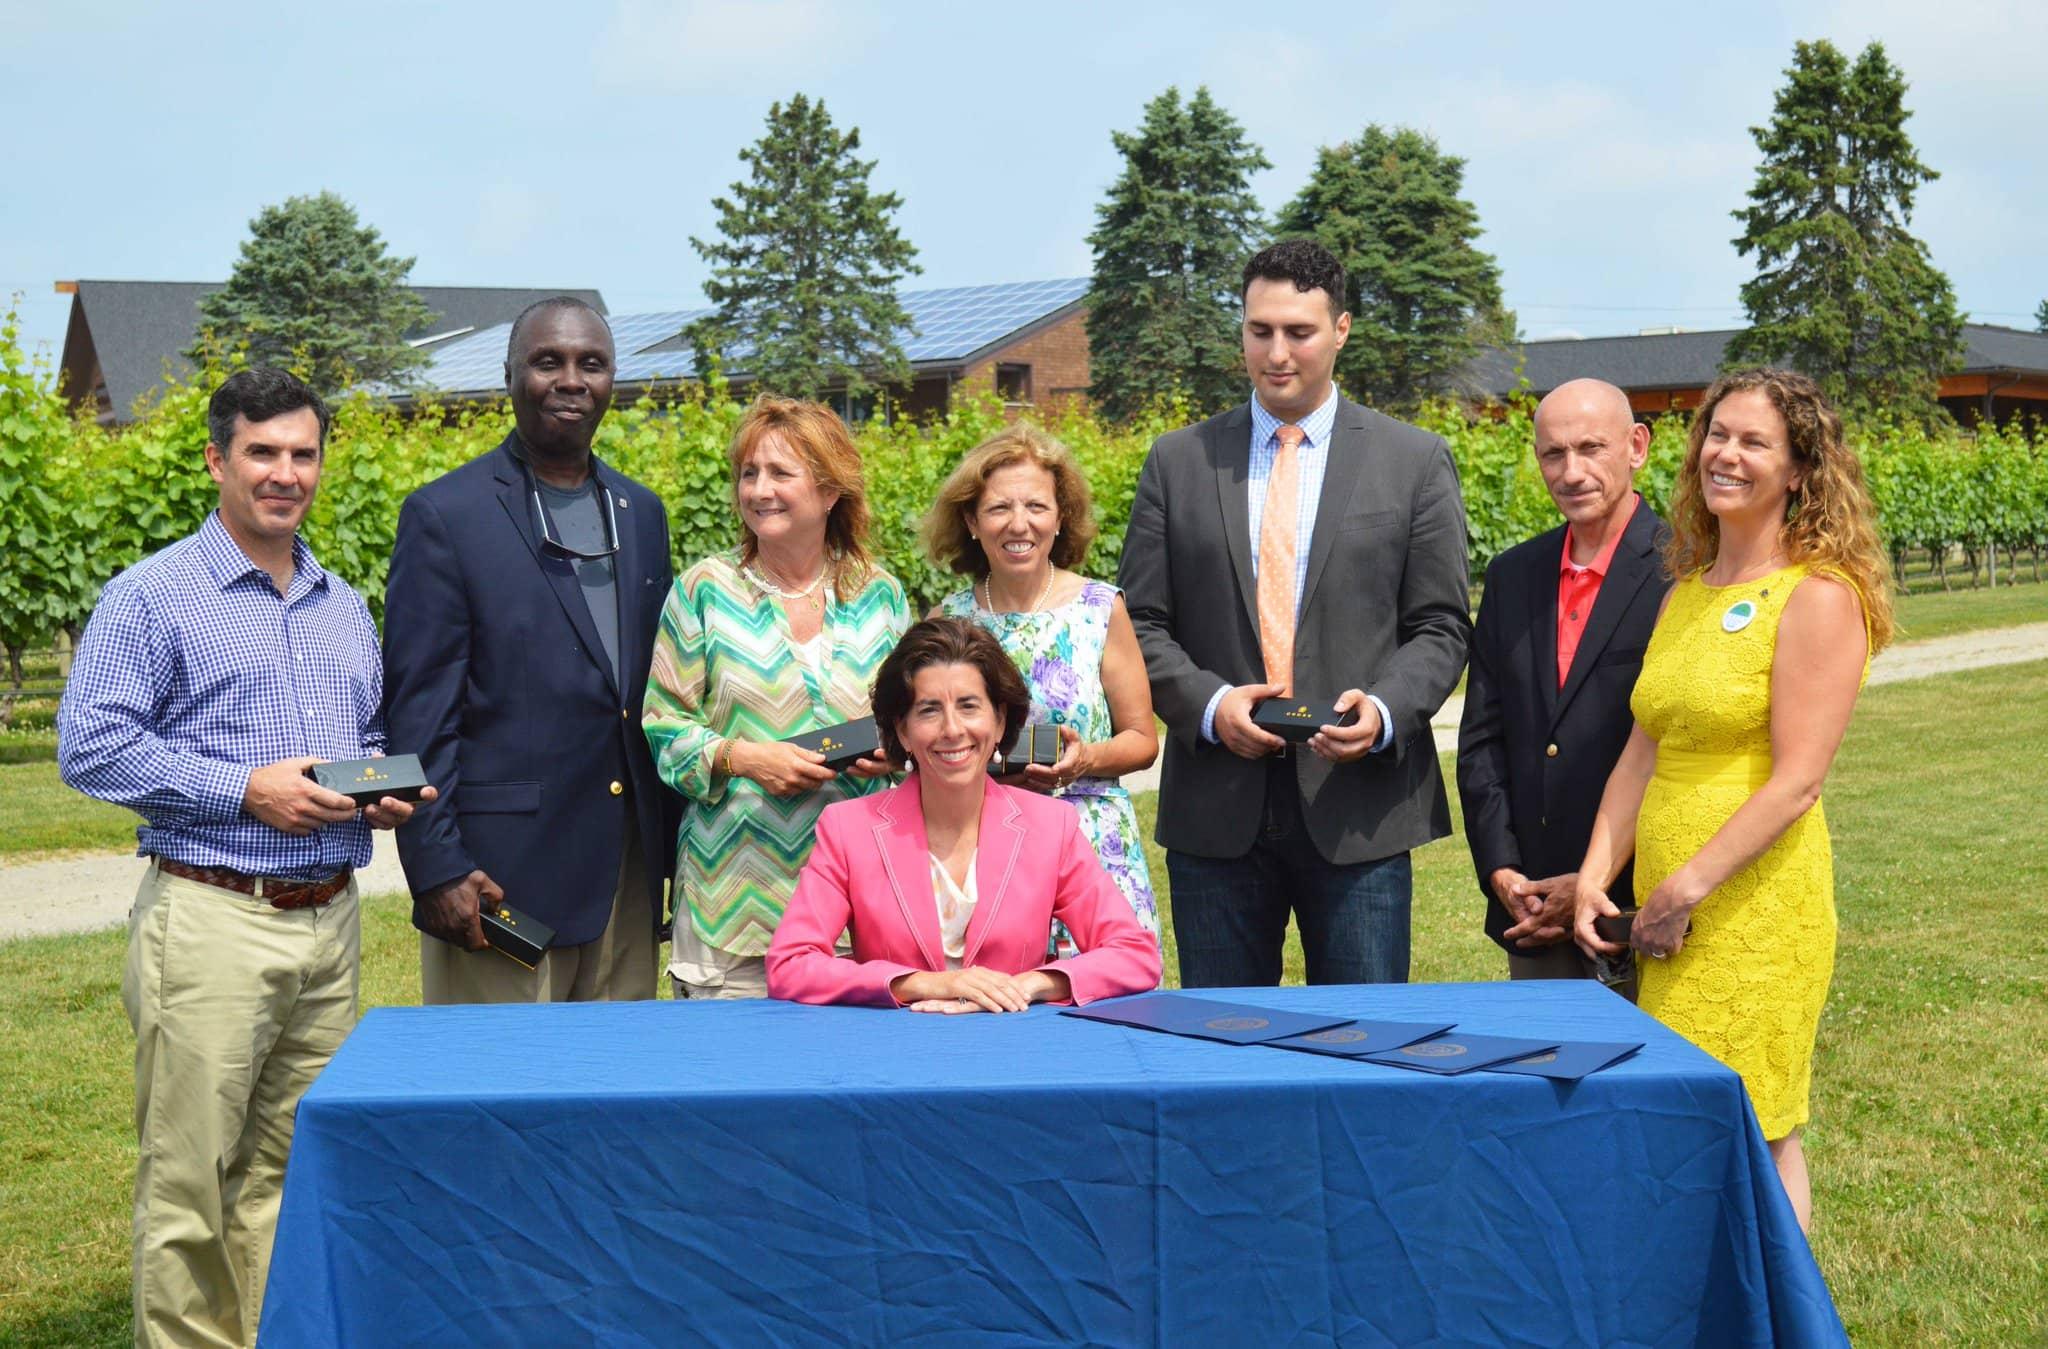 rhode-island Rhode Island Gov. Signs Package Of Renewable Energy Bills